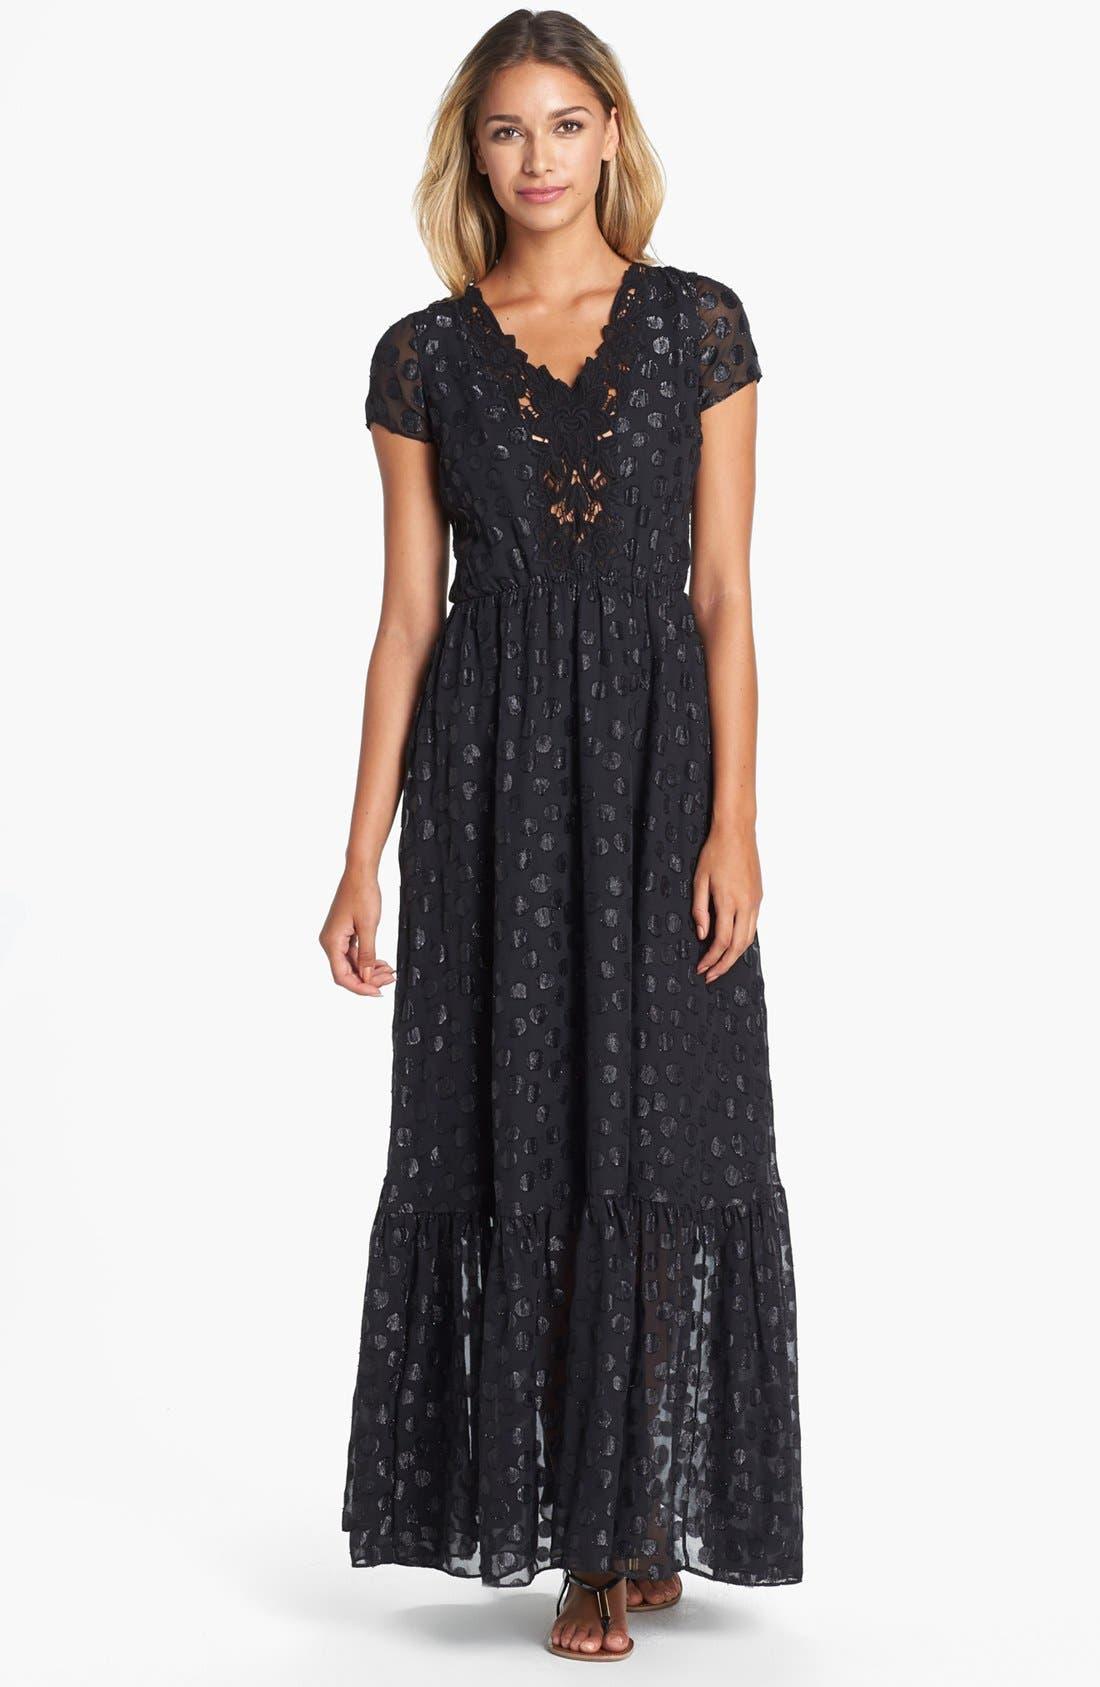 Alternate Image 1 Selected - Dress the Population 'Evan' Metallic Dot Maxi Dress